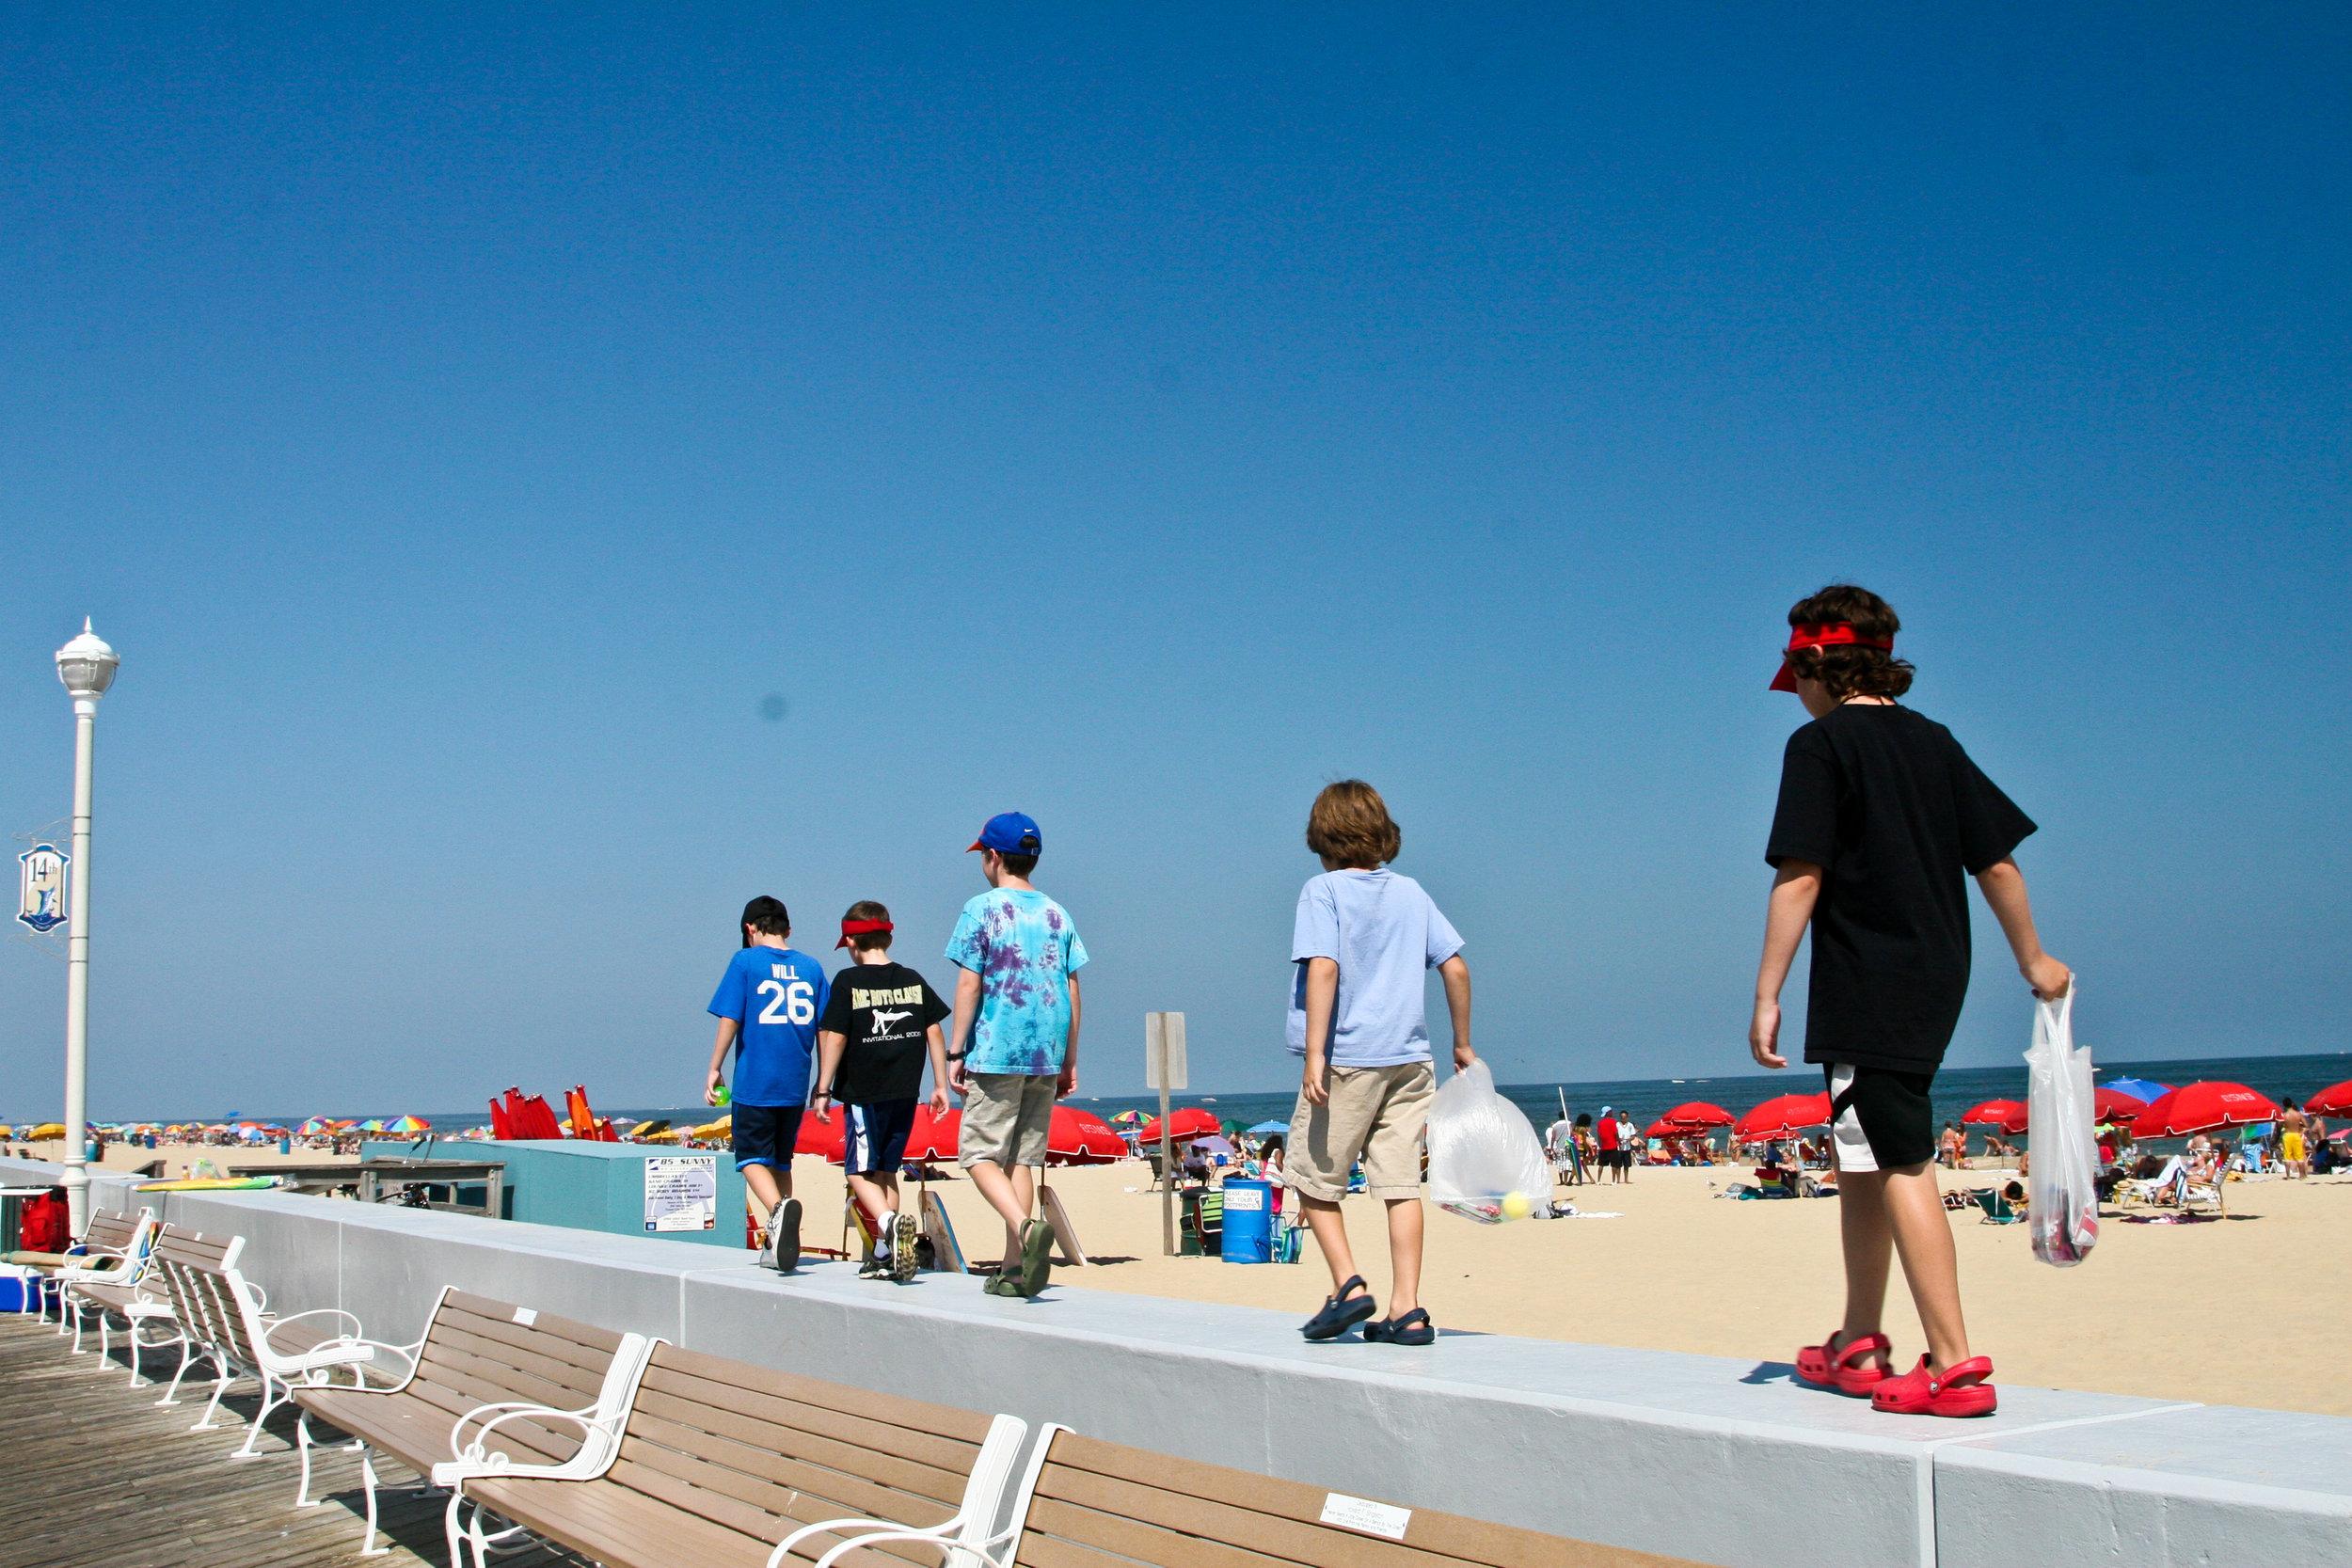 On the Boardwalk - Ocean City, Maryland